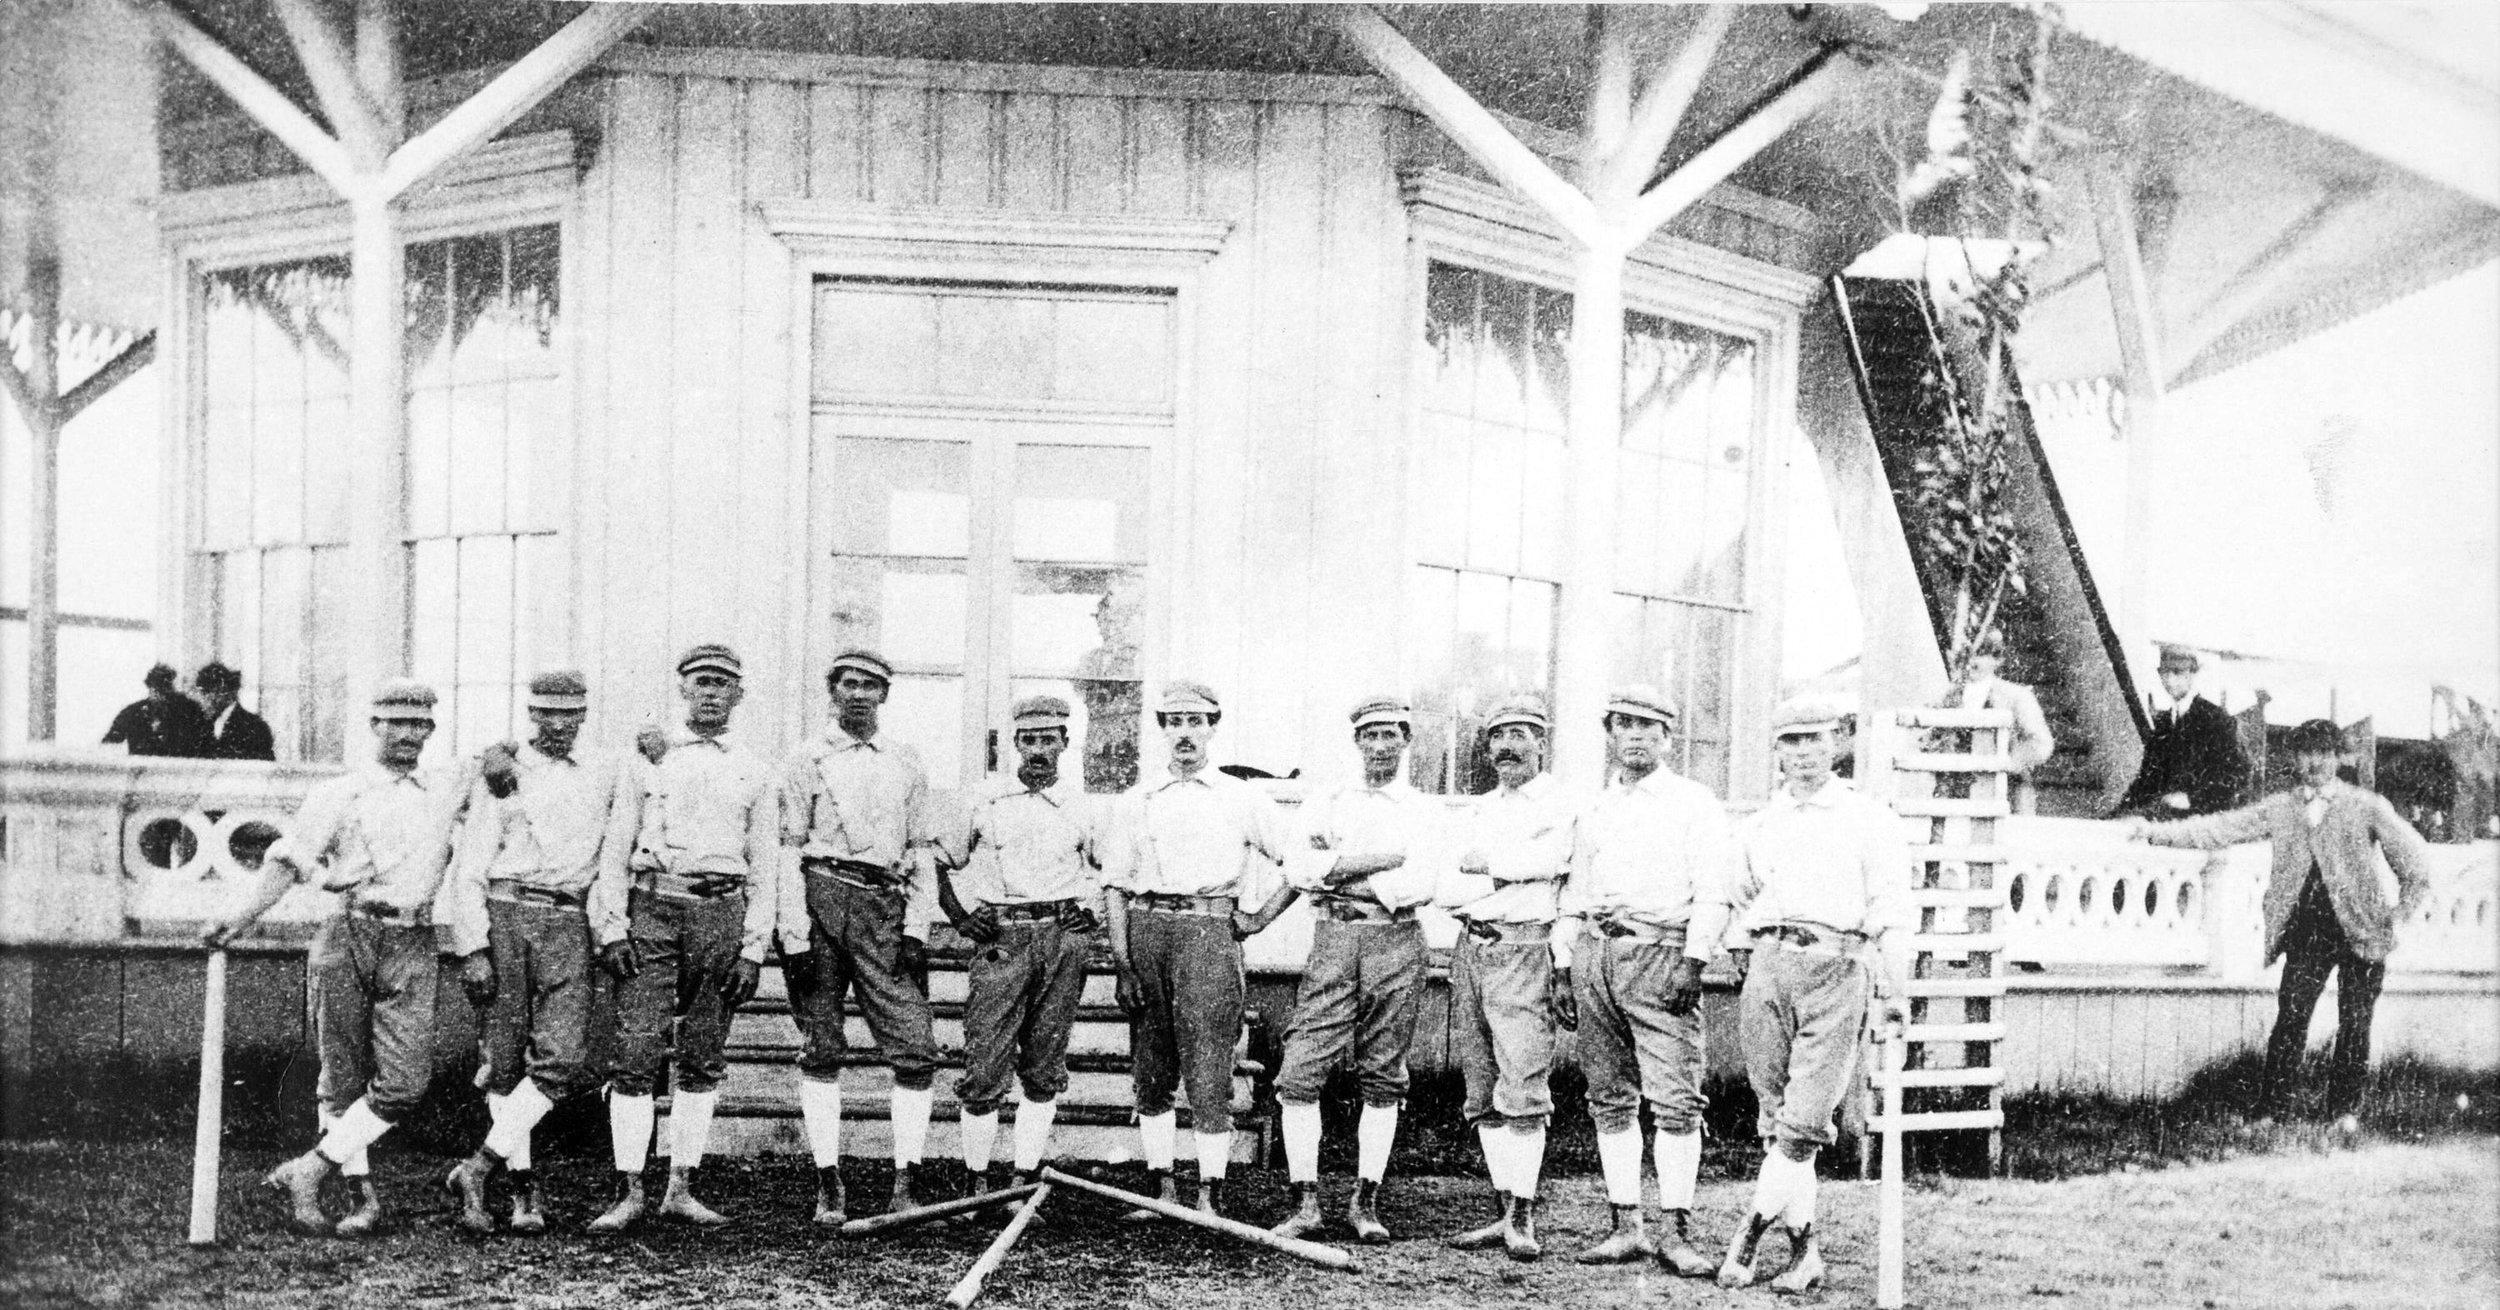 1870chicagoclub.jpg